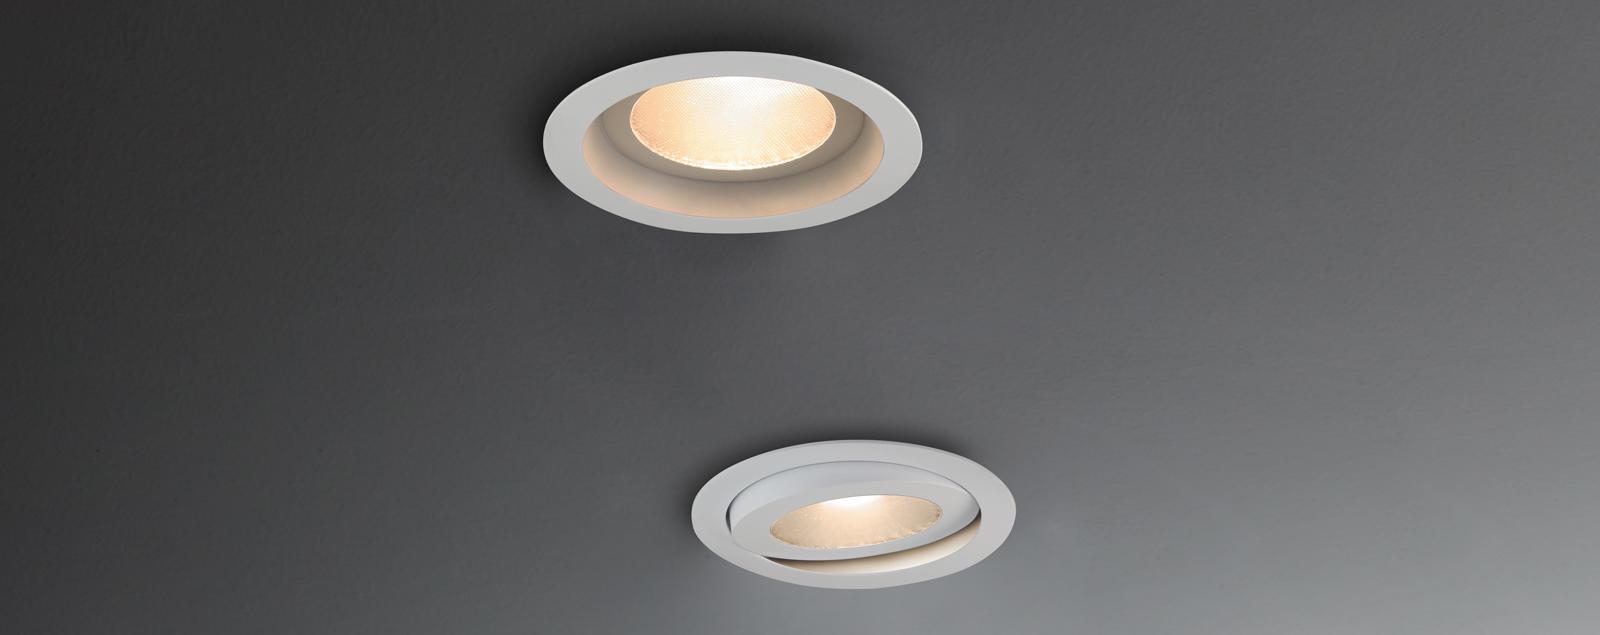 F40 Venus recessed lamp - Fabbian Illuminazione